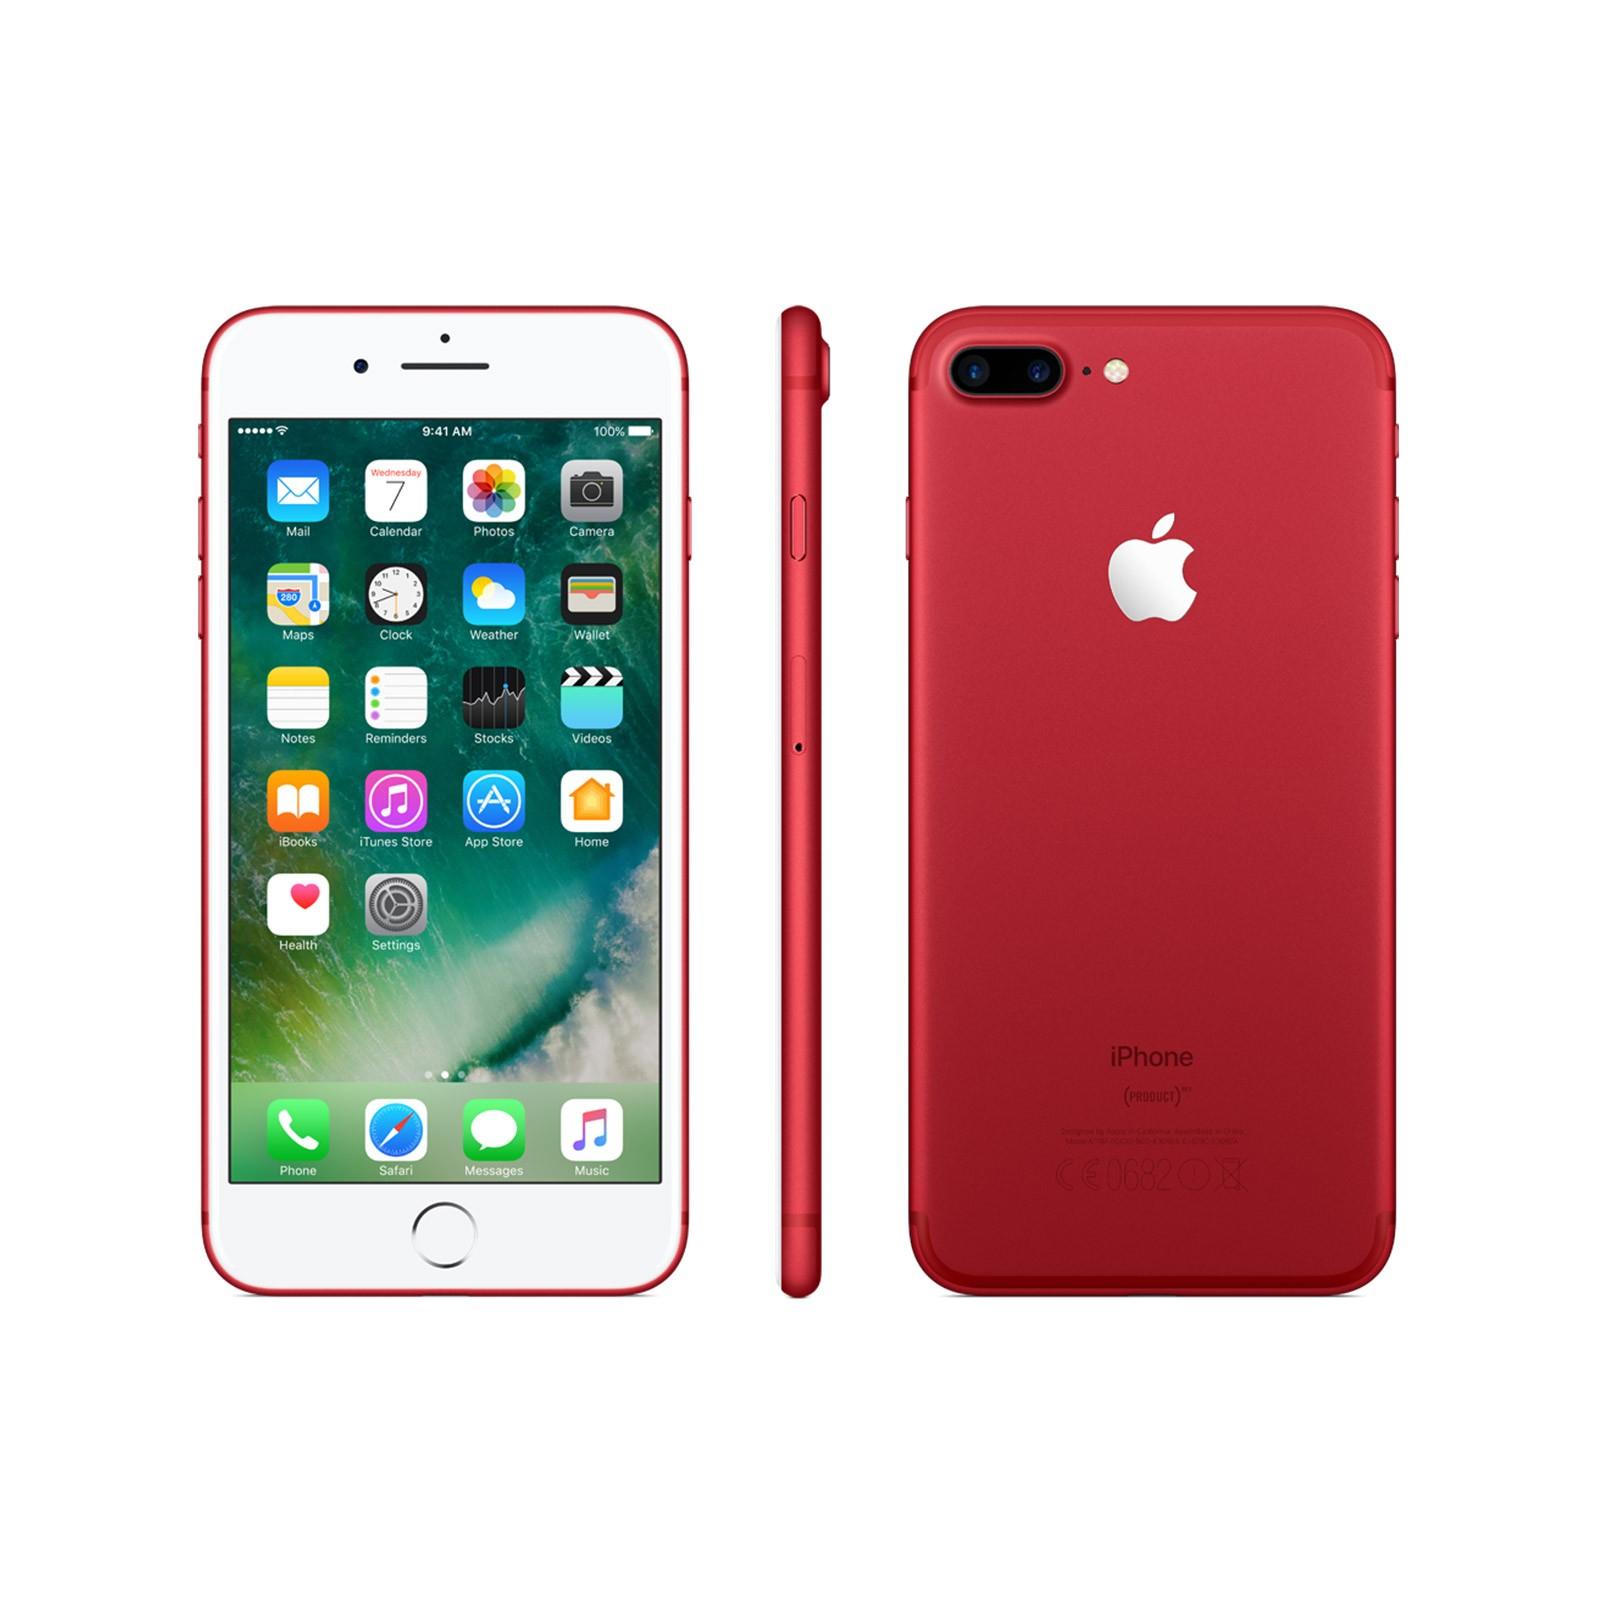 APPLE iPhone 7 Plus Red 128GB im Telekom Comfort Allnet für 31,99€ mtl.